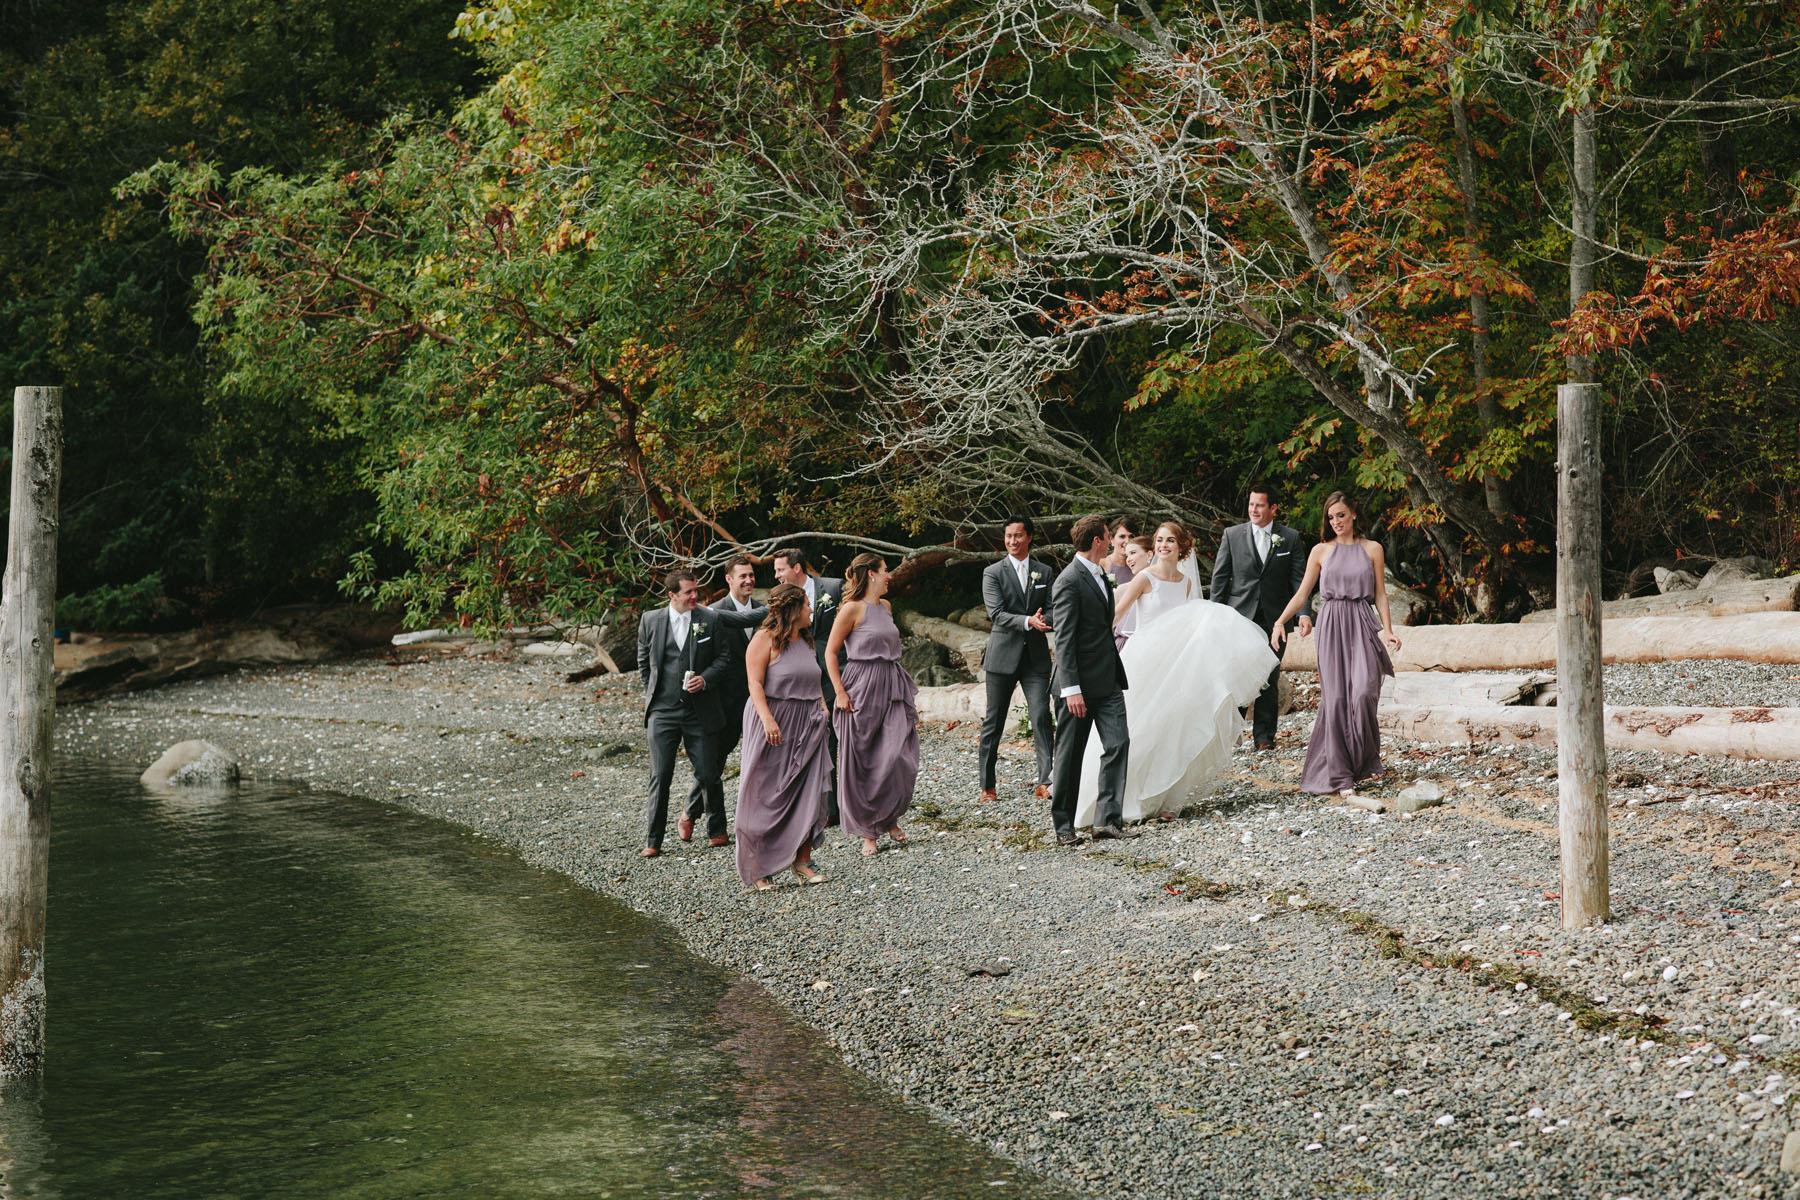 thetis-island-wedding-photographer-rp-rn-112.jpg